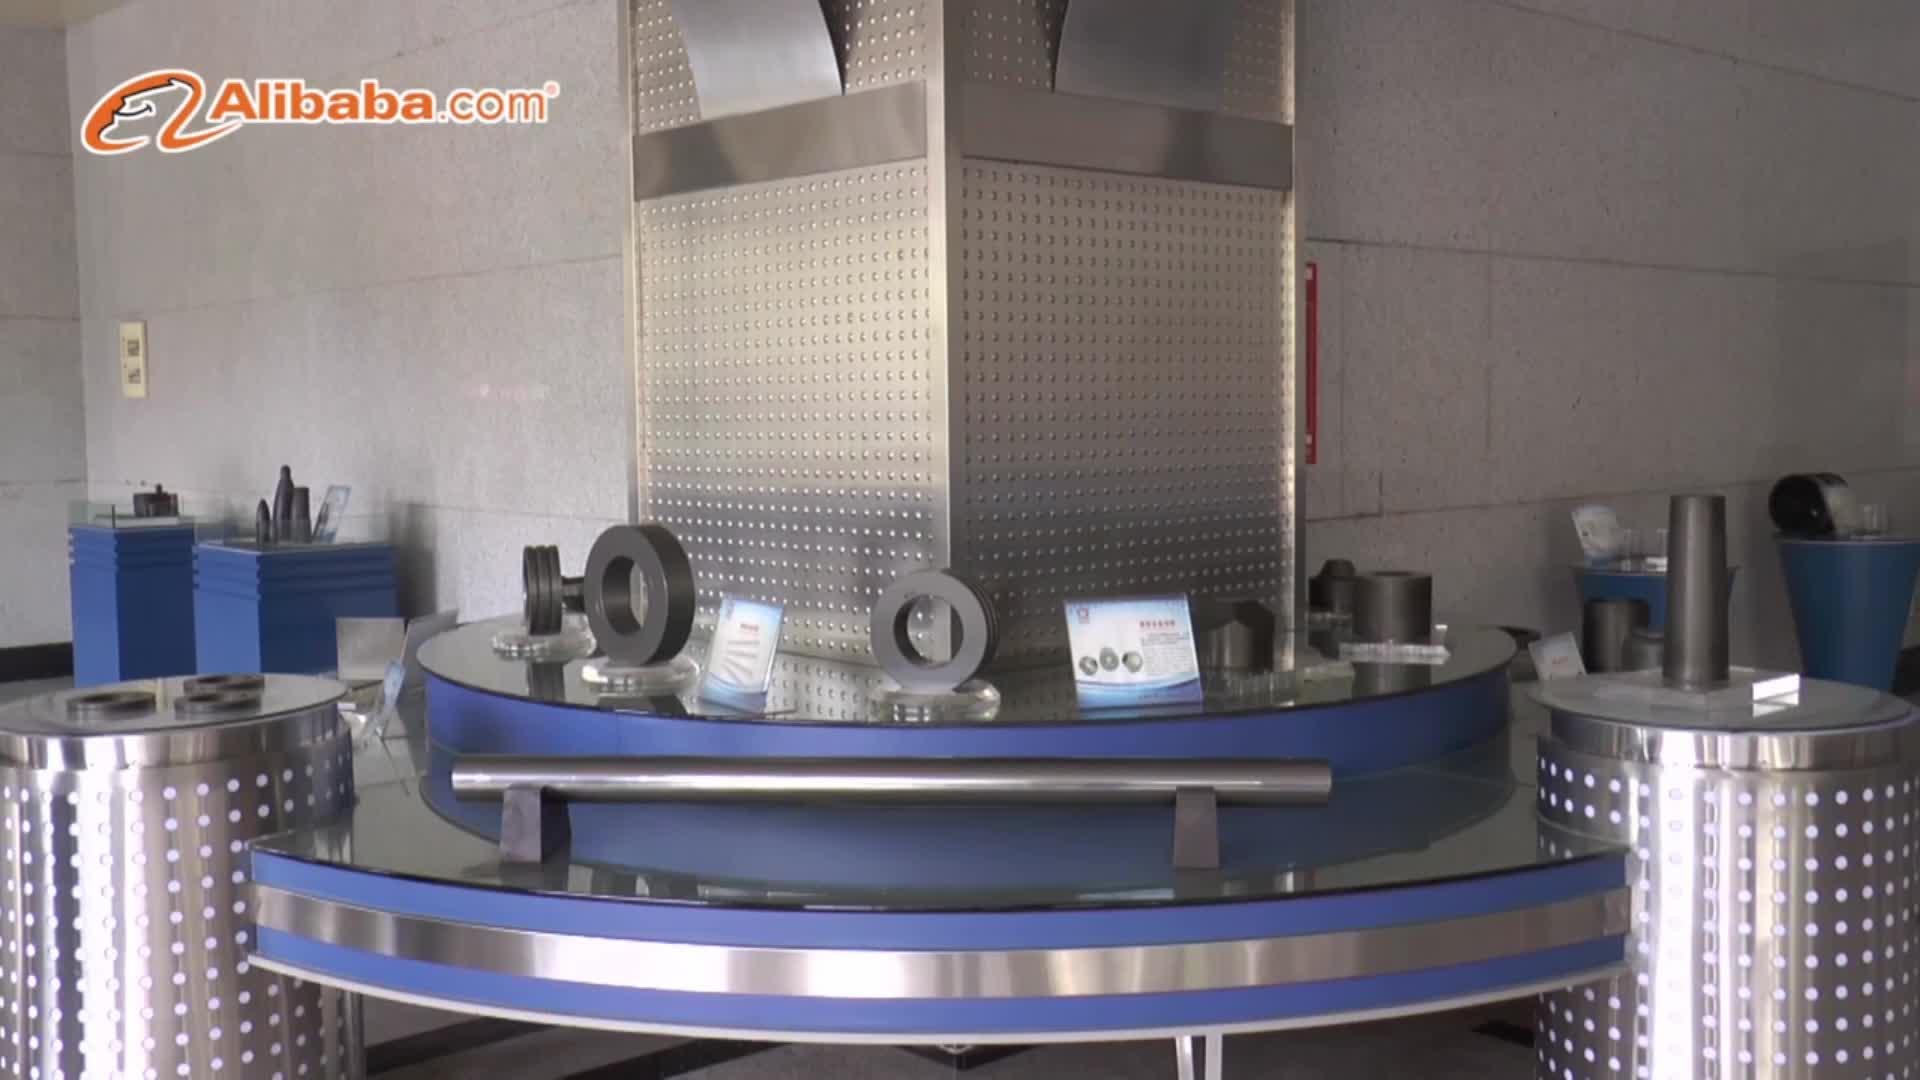 चीन उच्च गति रोलिंग मिलों के लिए डायमंड ब्रांड टंगस्टन कार्बाइड रोलर्स